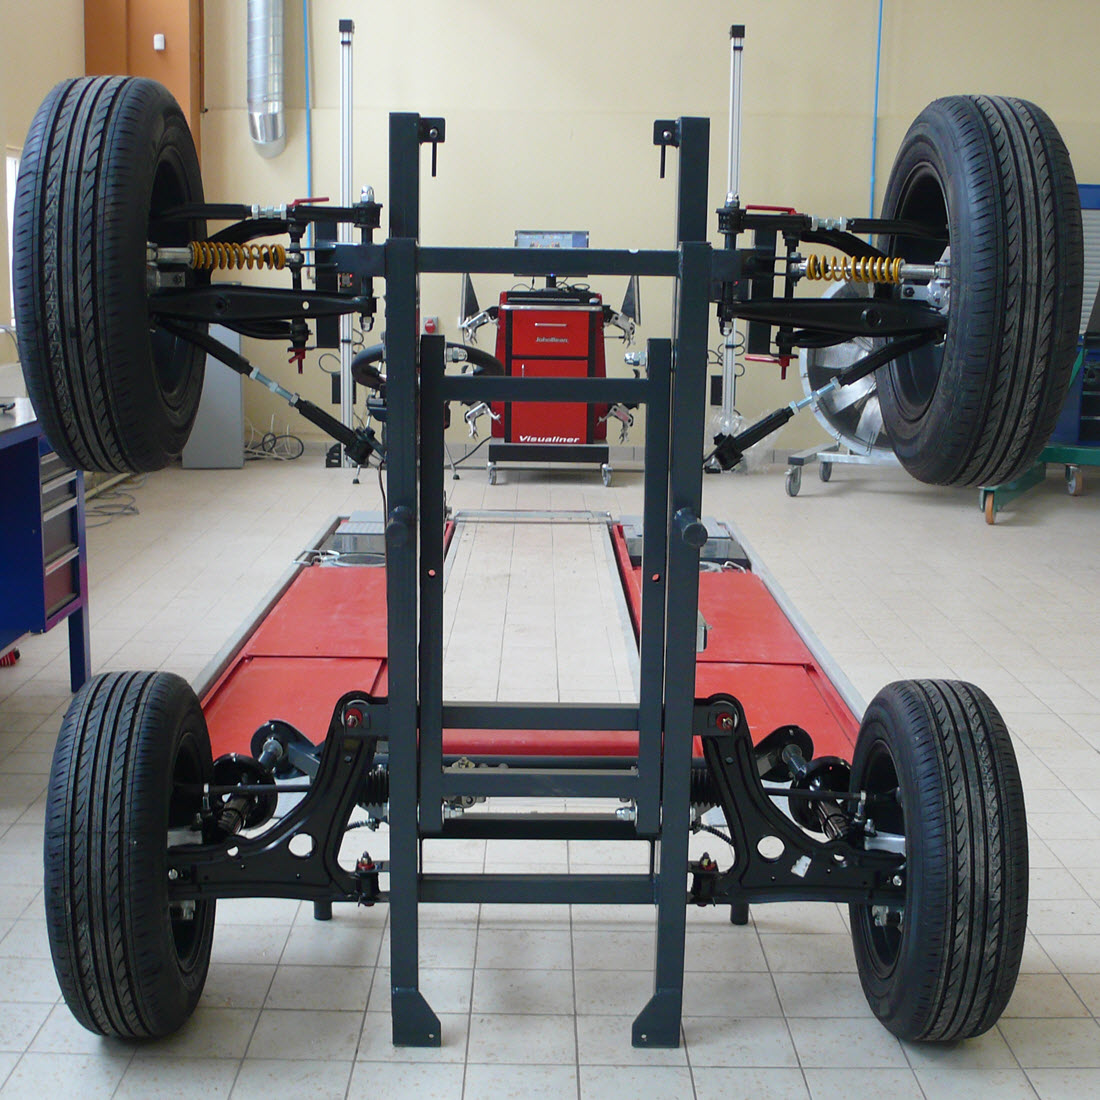 wheel-alignment-training-stand